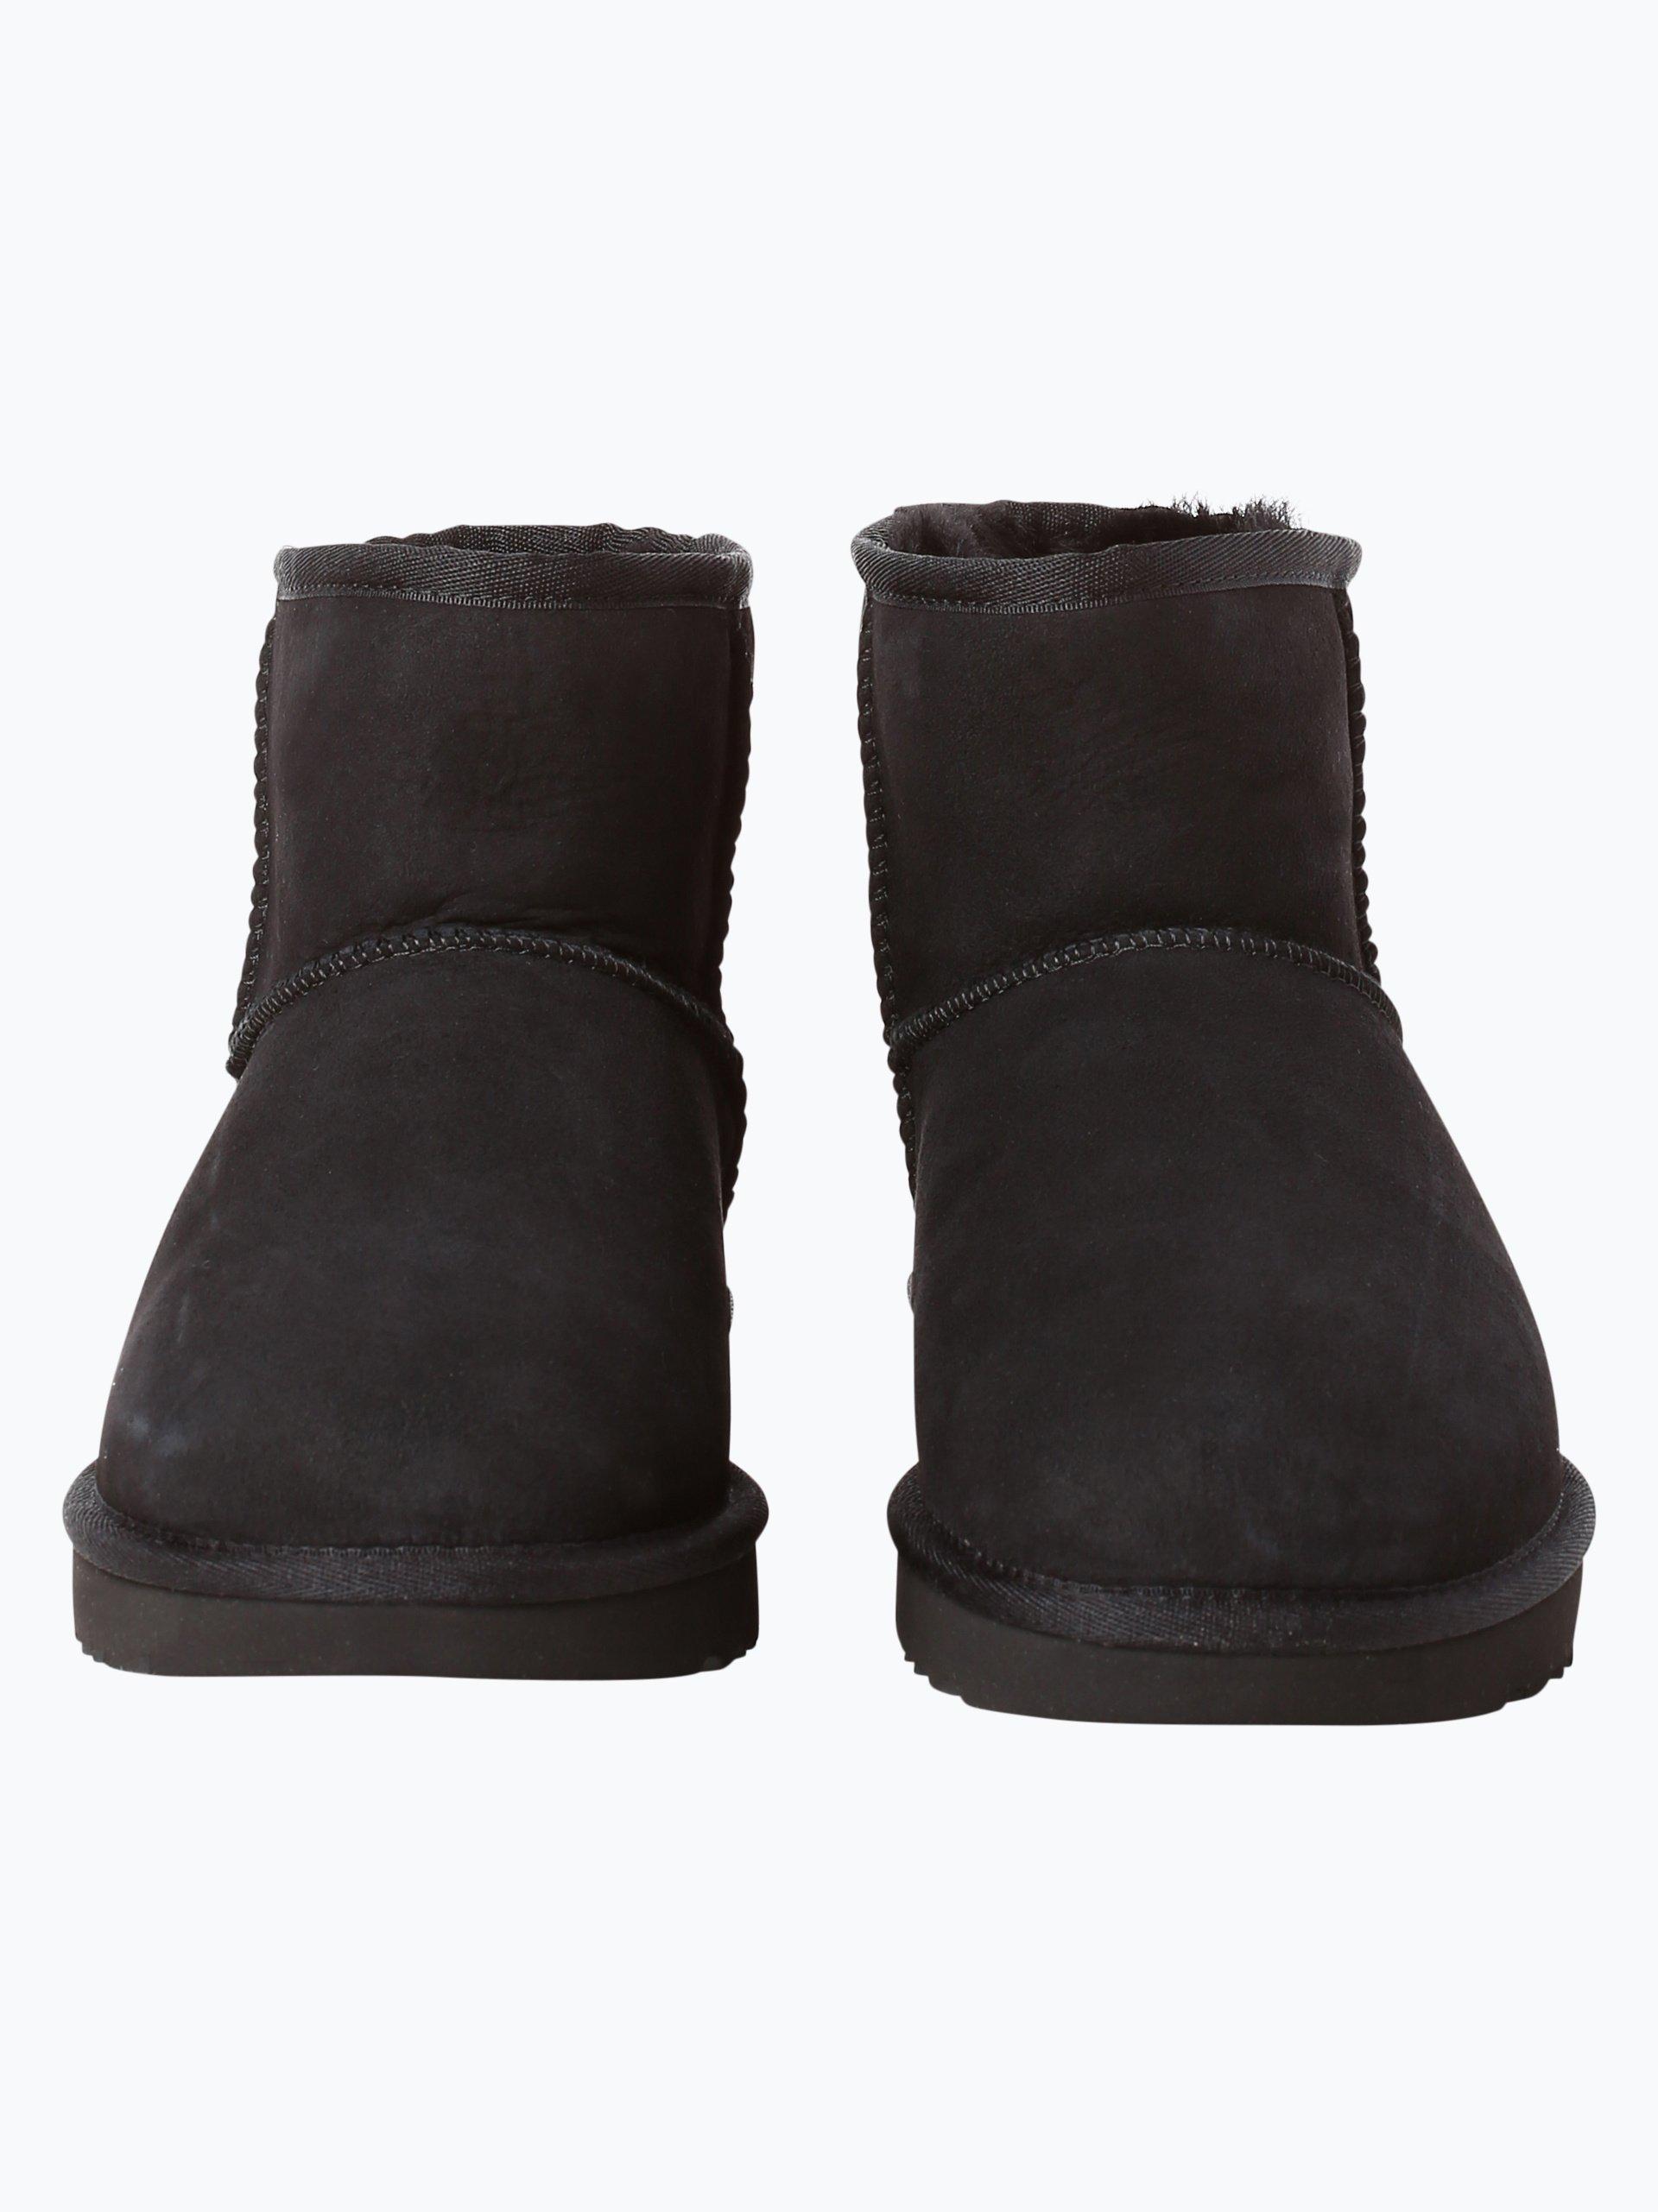 ugg damen boots aus leder schwarz uni online kaufen peek. Black Bedroom Furniture Sets. Home Design Ideas